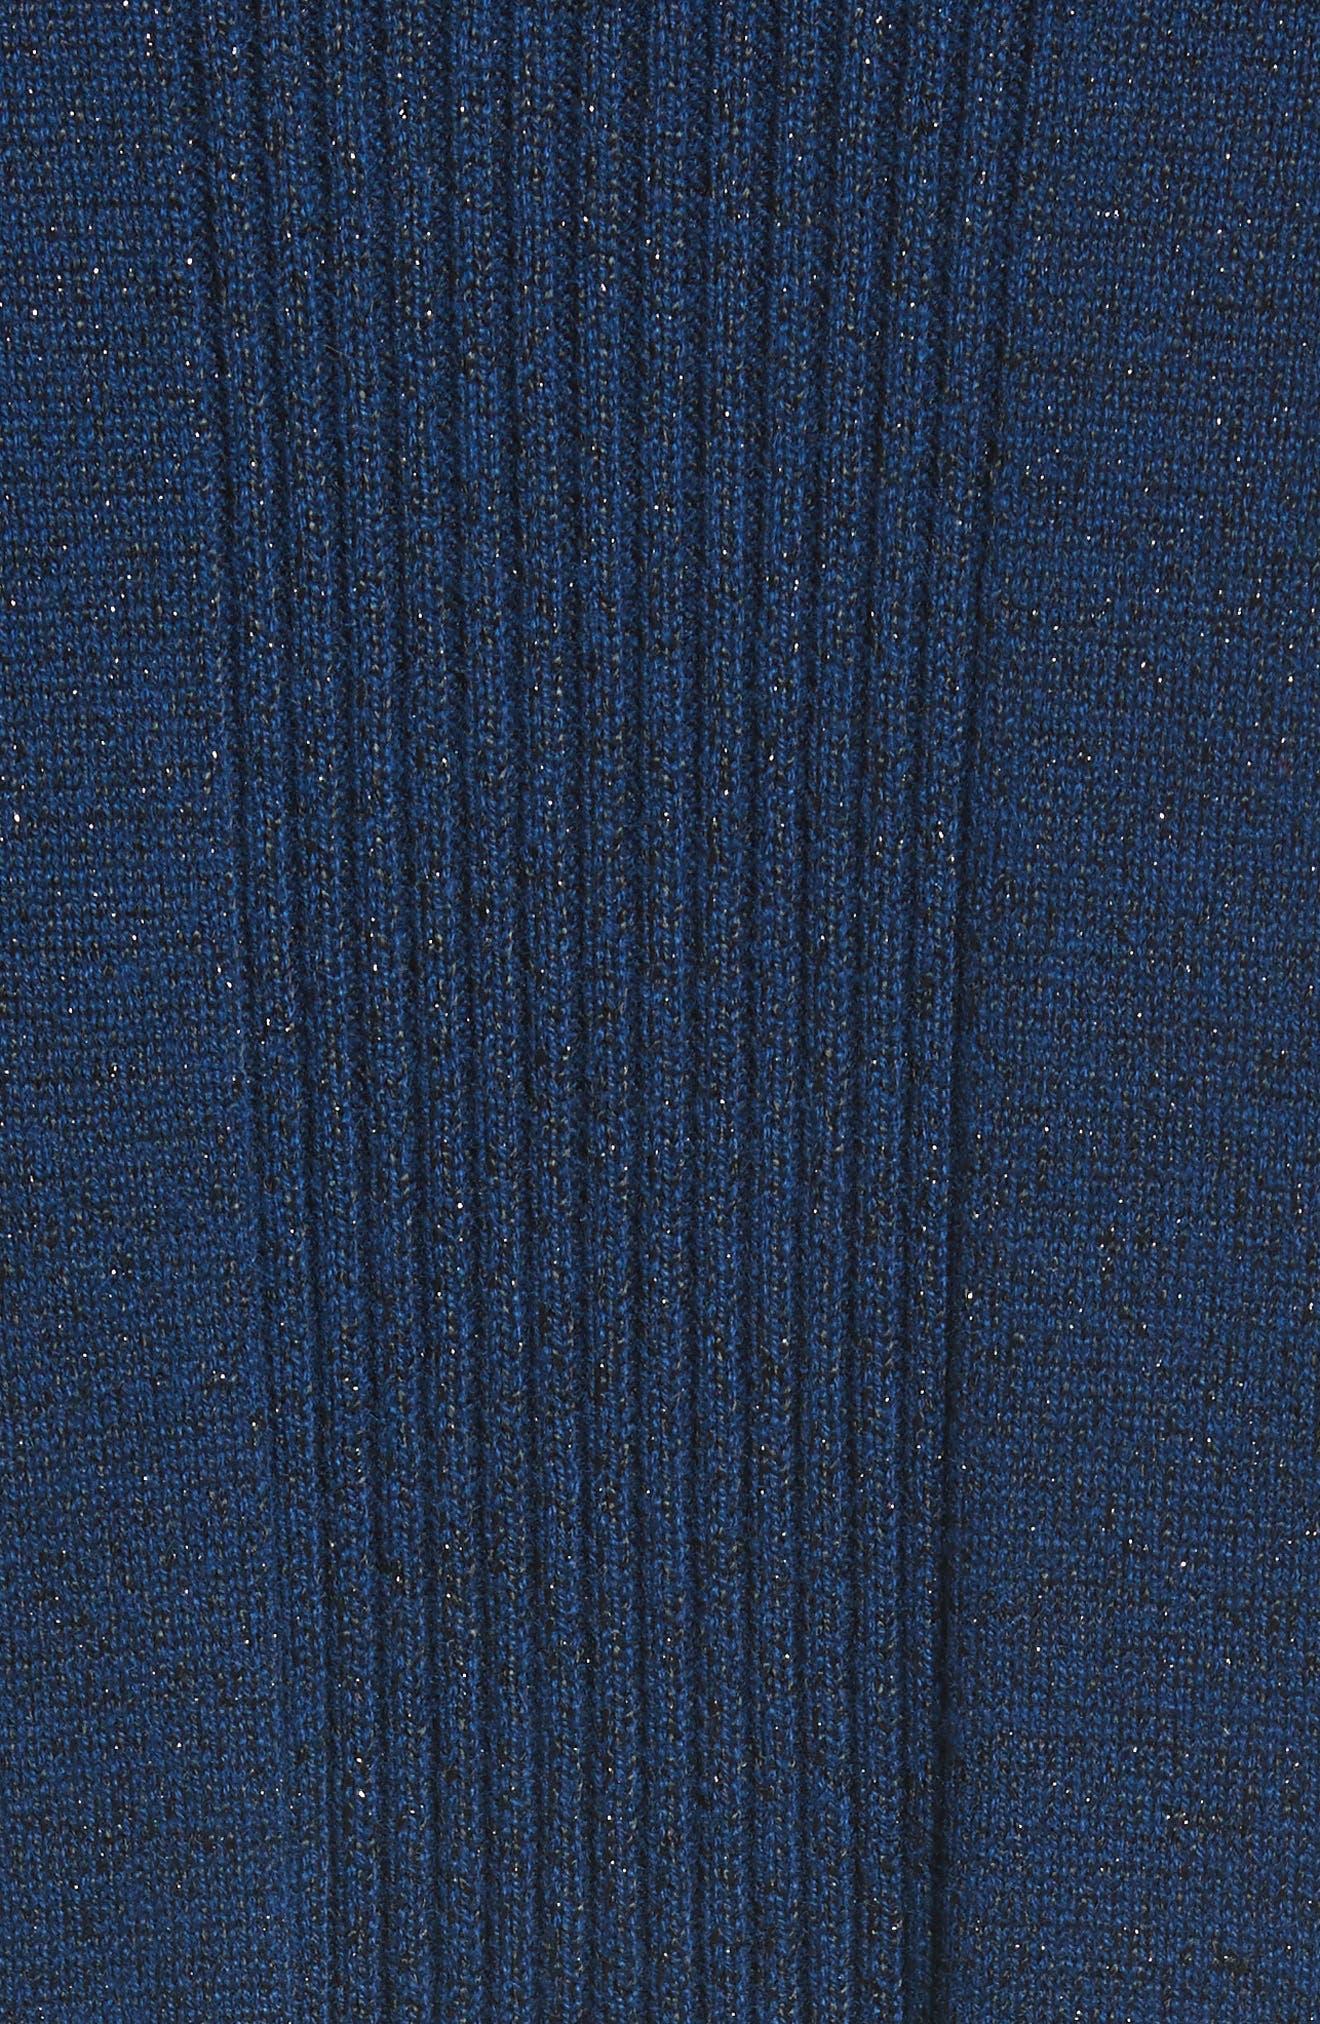 Jersey Cashmere Blend Sparkle Knit Jacket,                             Alternate thumbnail 6, color,                             410